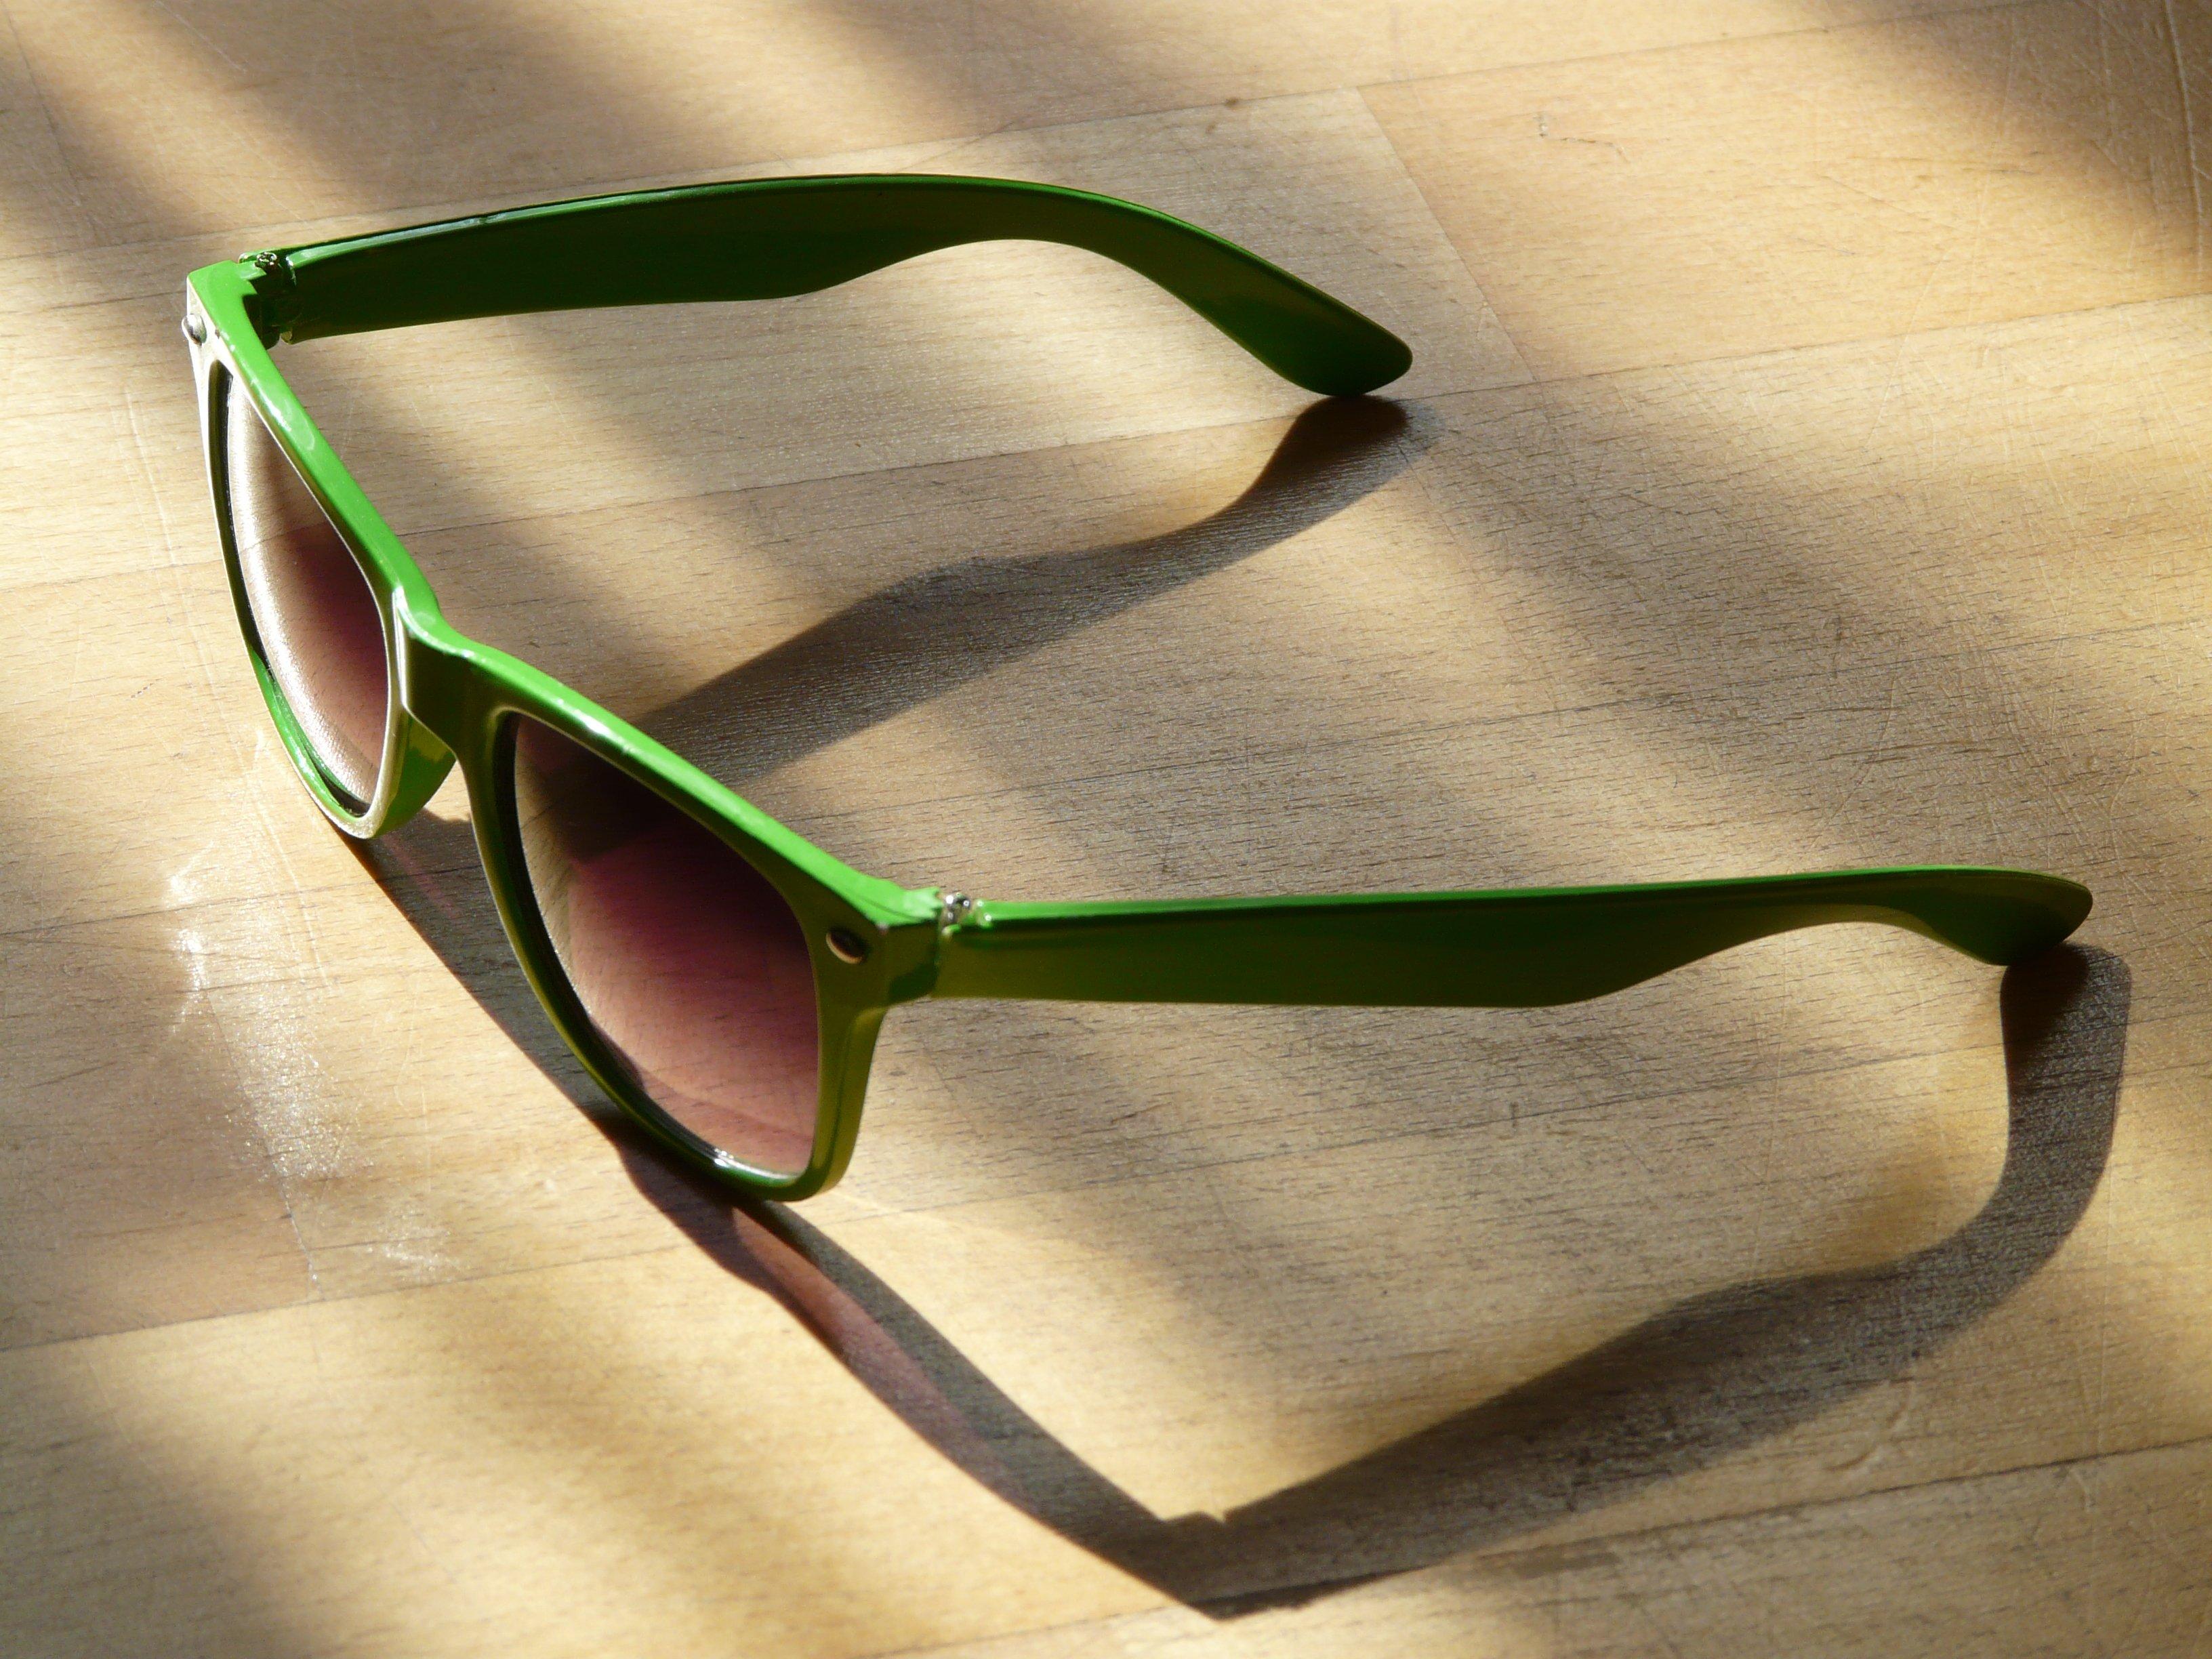 d9b12abb6d sun dark green sunglasses glasses overview eyewear see sharpness fashion  accessory vision care